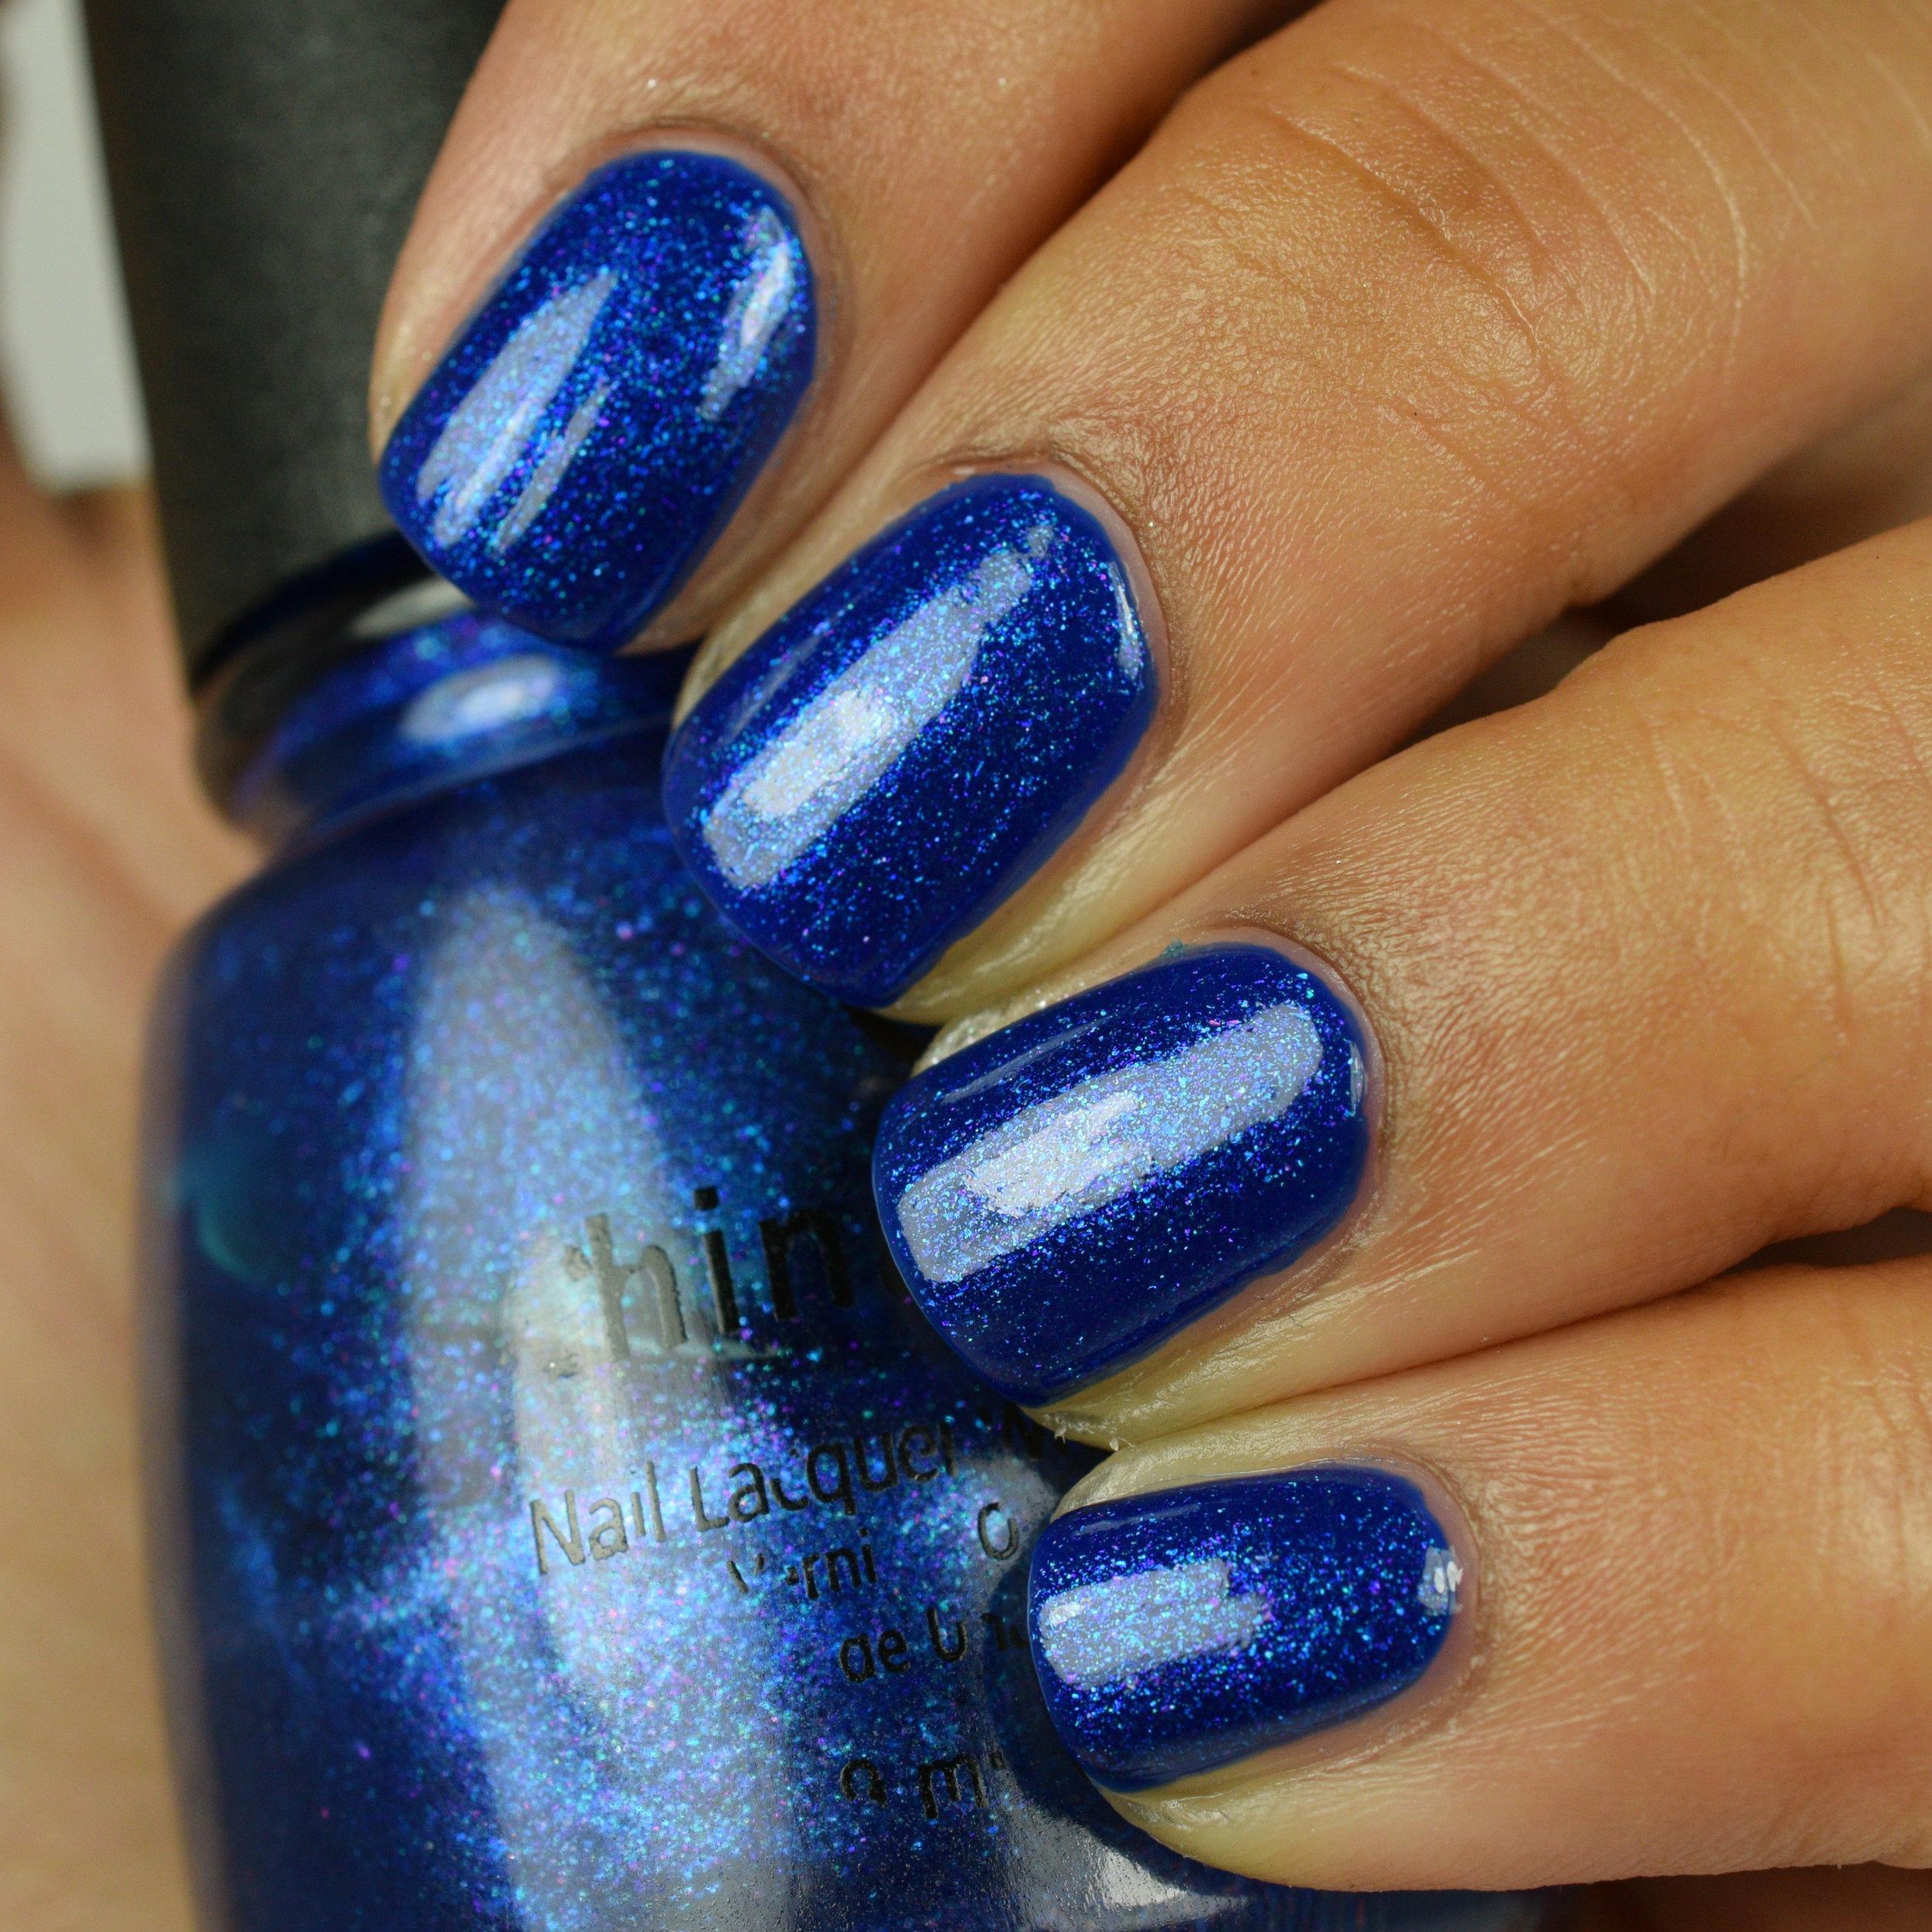 China Glaze Drinkin' My Blues Away over Dior Sailor.jpg